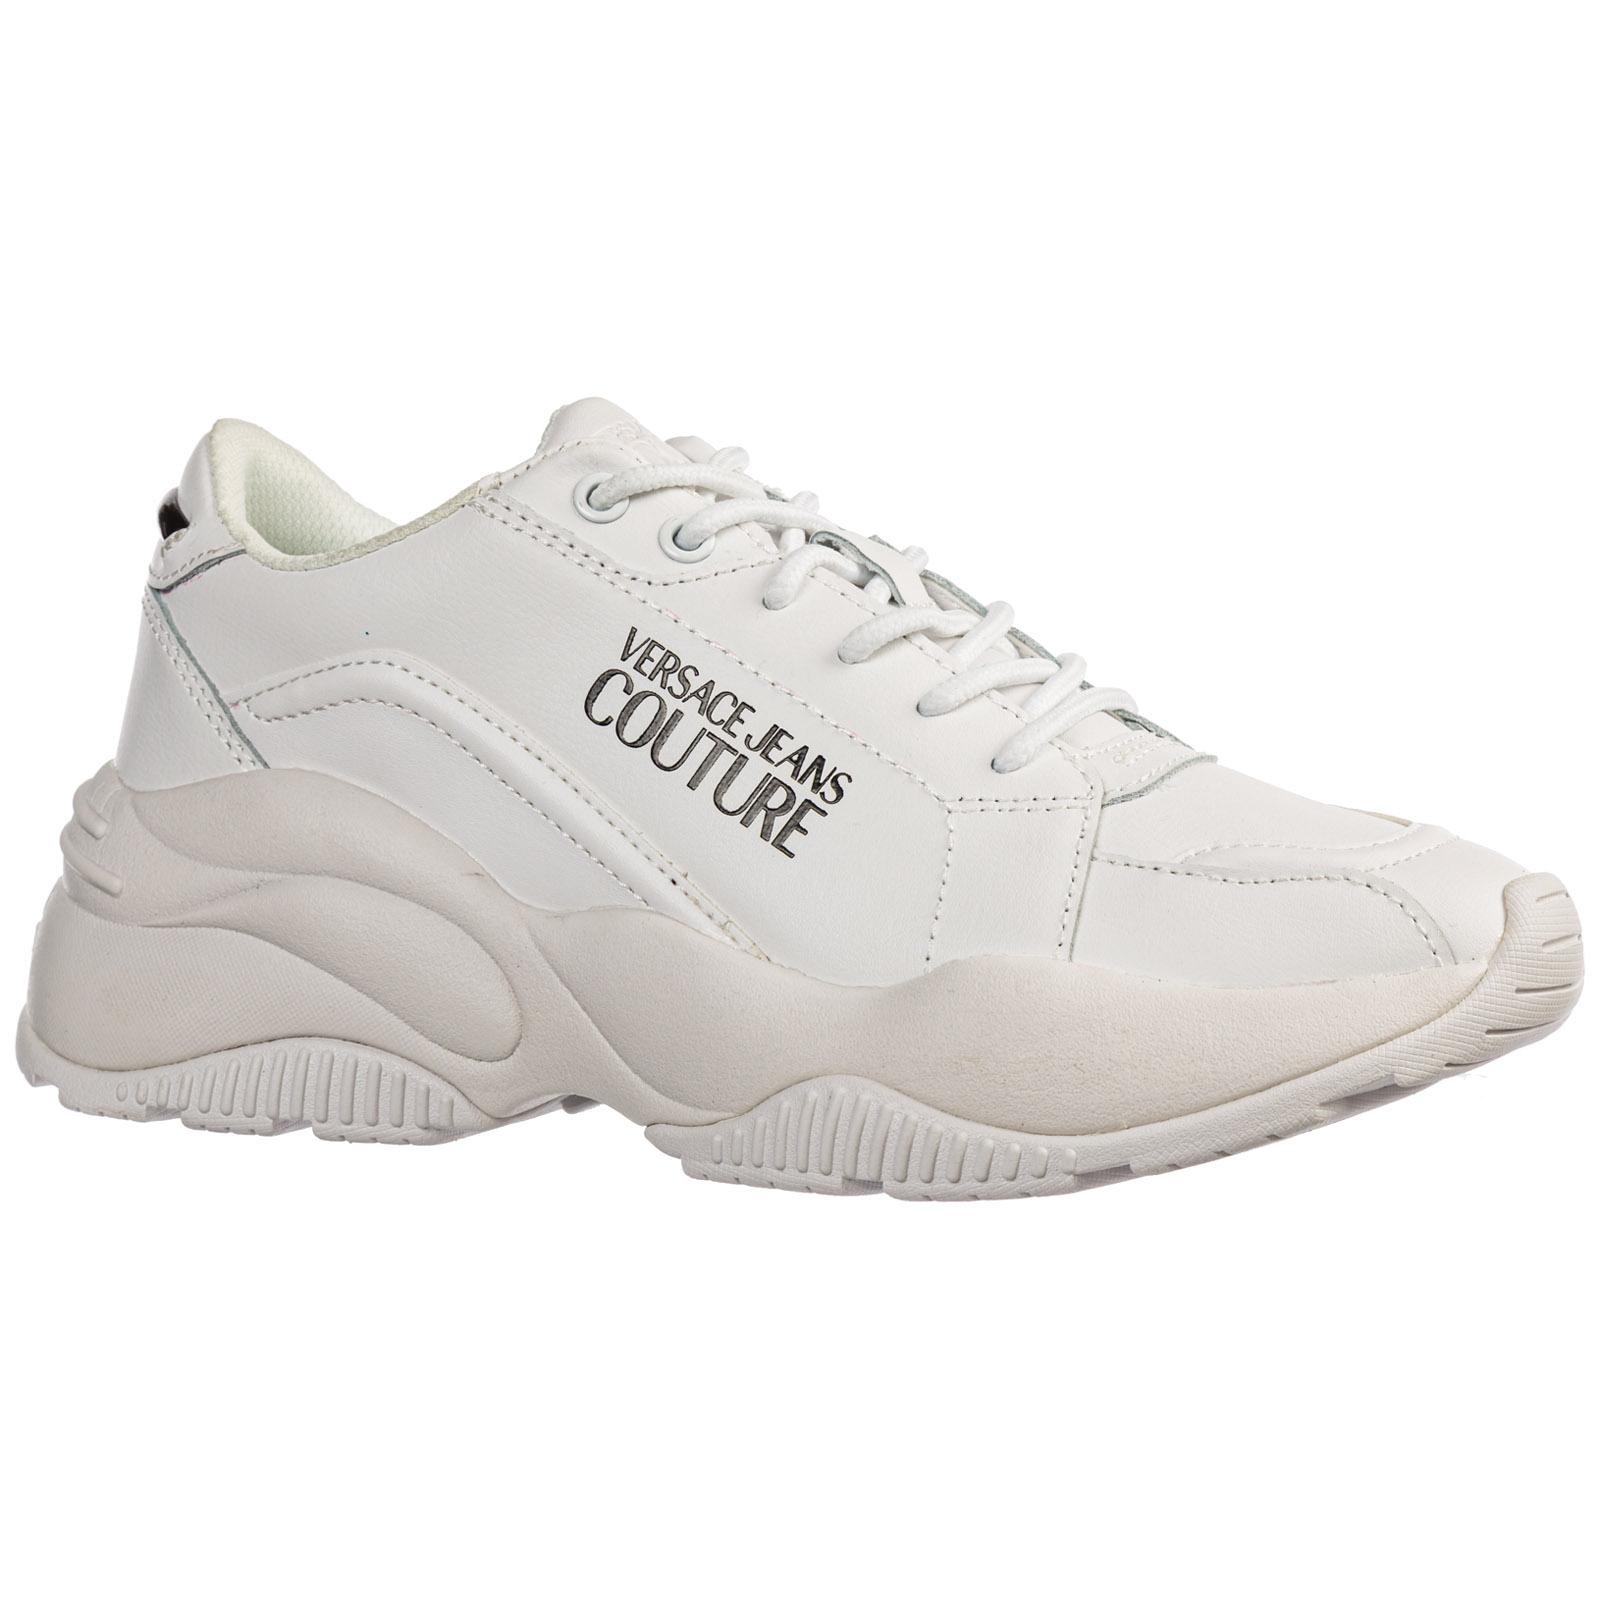 Versace Jeans Low Sneakers & Tennisschuhe Damen Schuhe